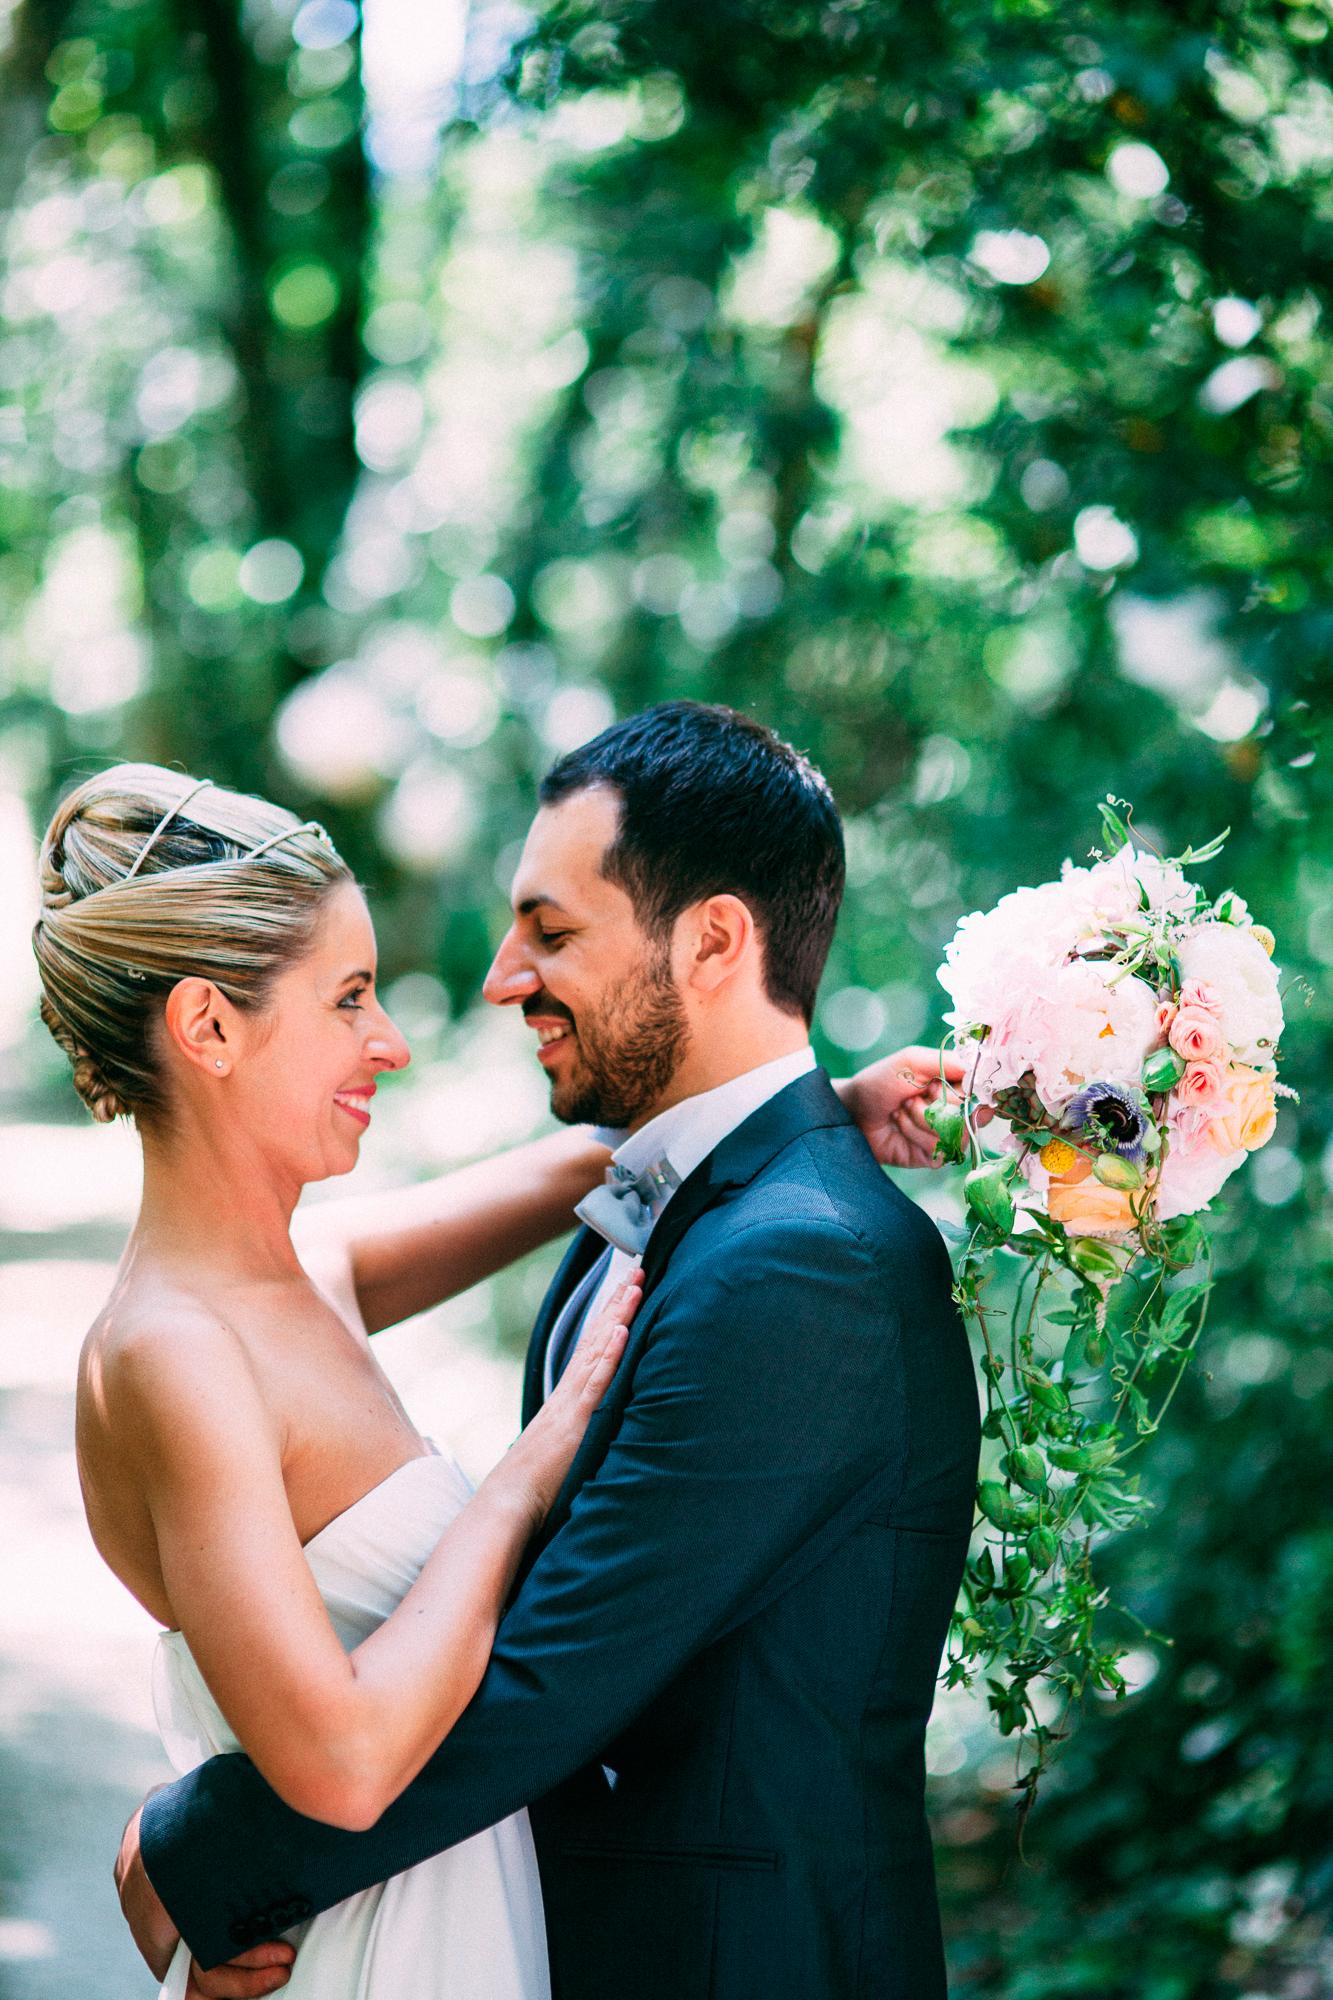 177-bride groom wedding portrait photographer marche conero.jpg